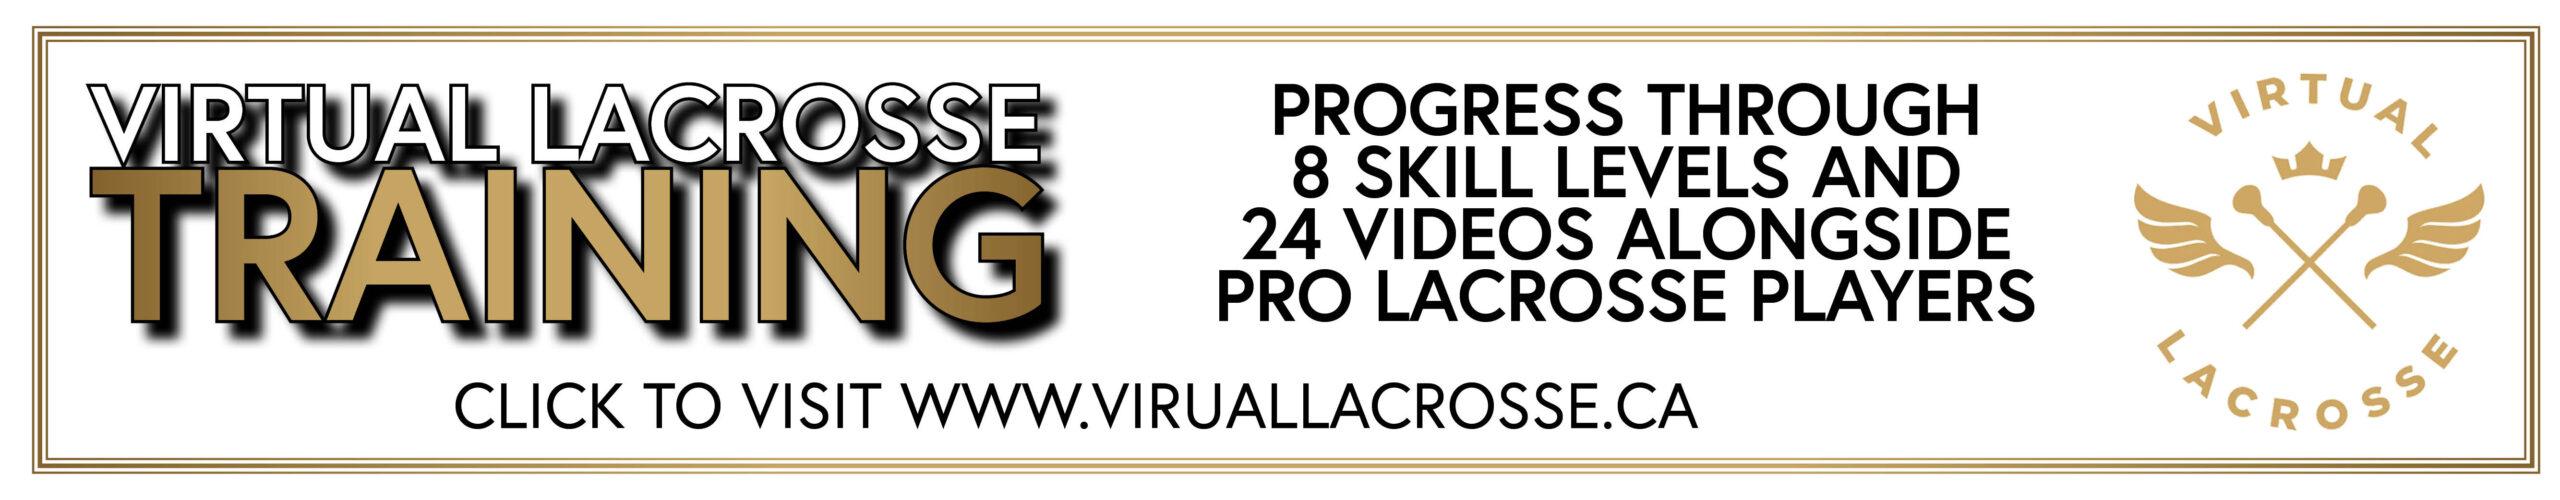 Virtual lacrosse ad